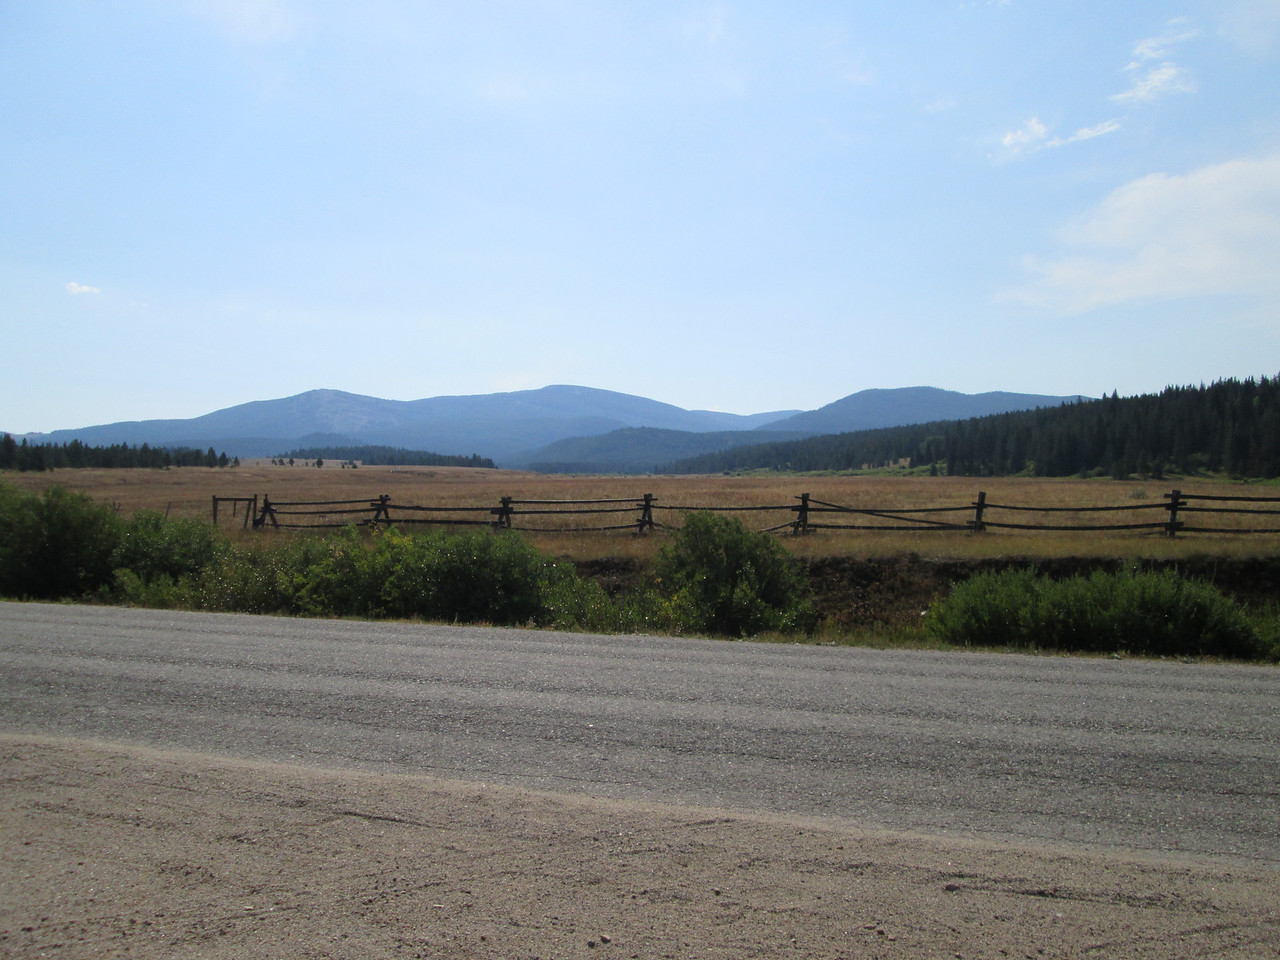 20130813 SE from Ranch toward Burnt Mt